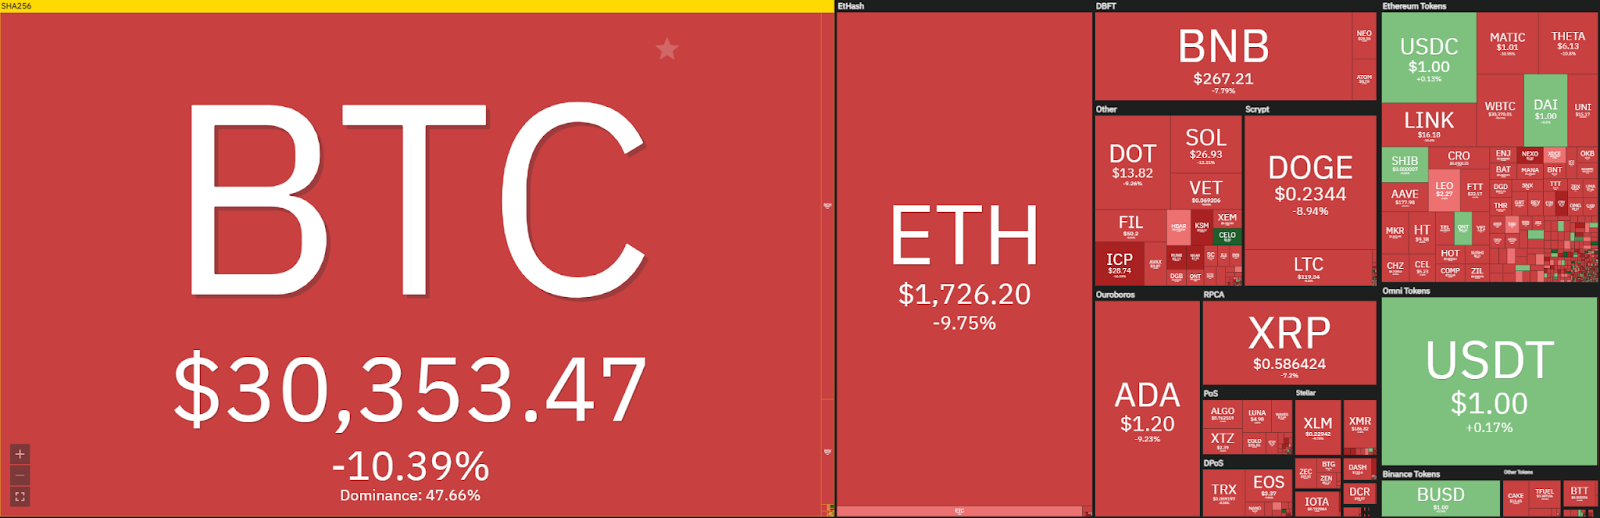 Ripple price analysis: Ripple slowly retraces to $0.70, starts to push below $0.50? 1